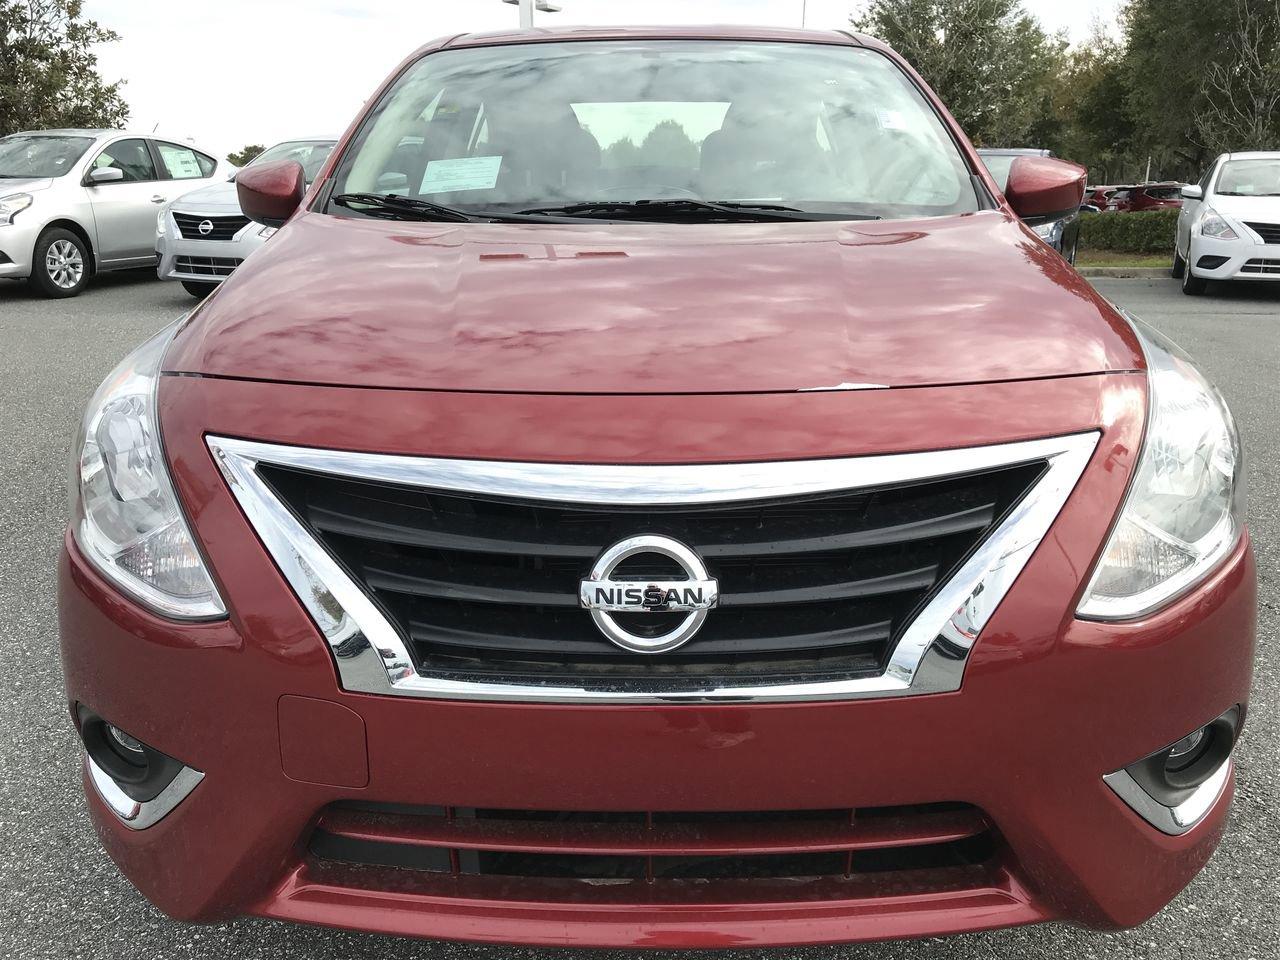 New 2019 Nissan Versa Sedan SV